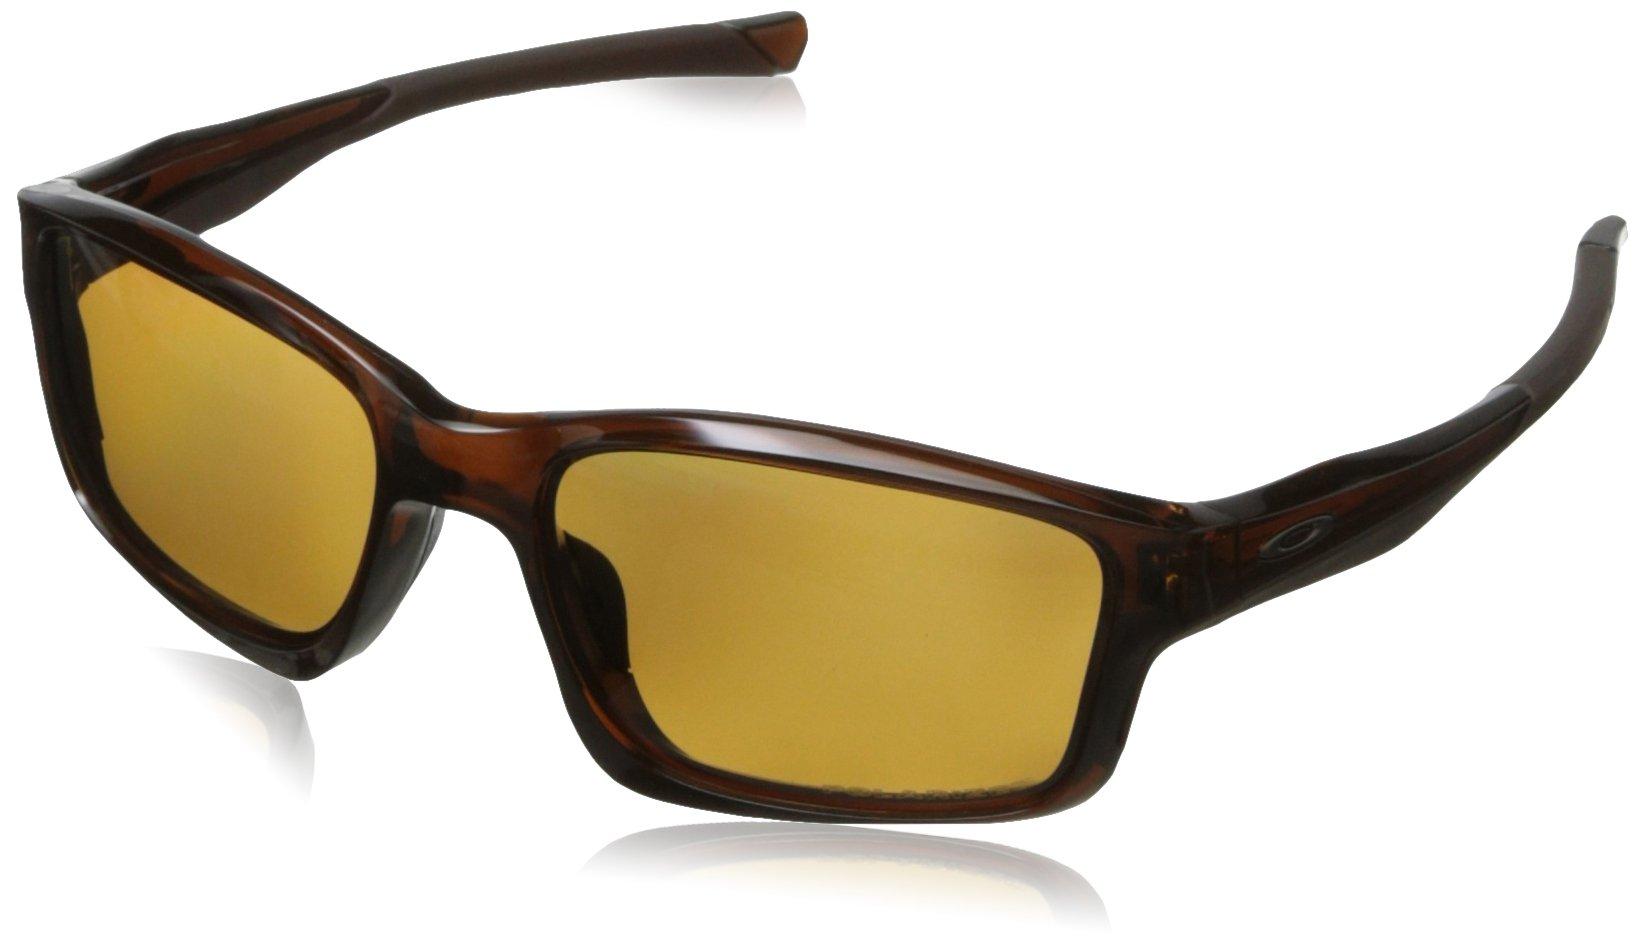 Oakley Mens Chailink OO9247-08 Polarized Ractangular Eyeglasses, Polished Rootbeer, 57 mm